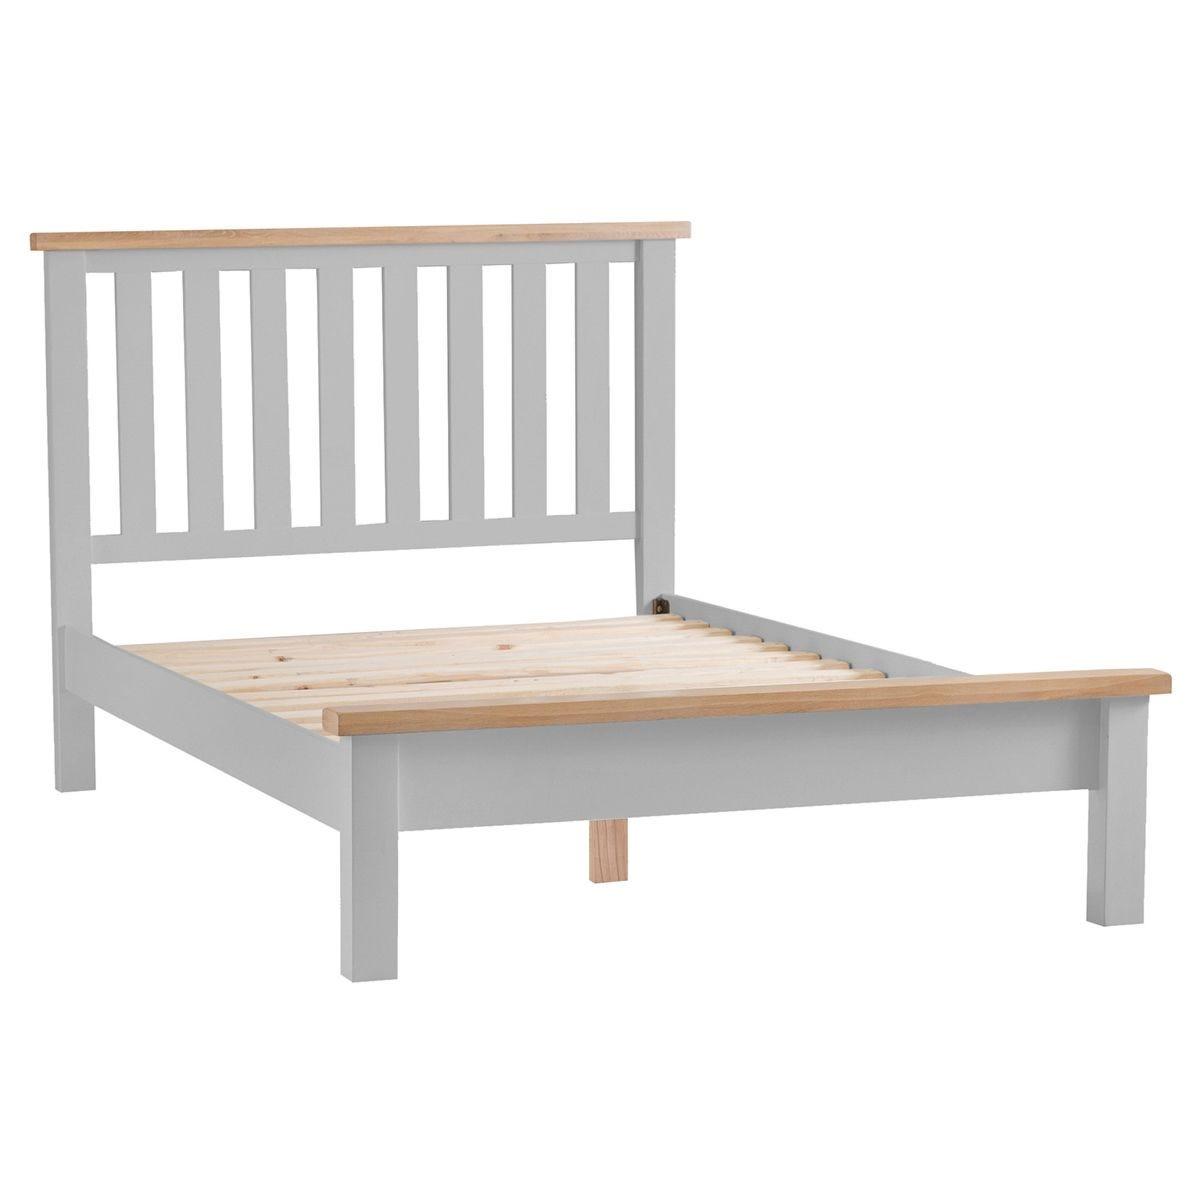 Madera Super King Bed Frame - Grey